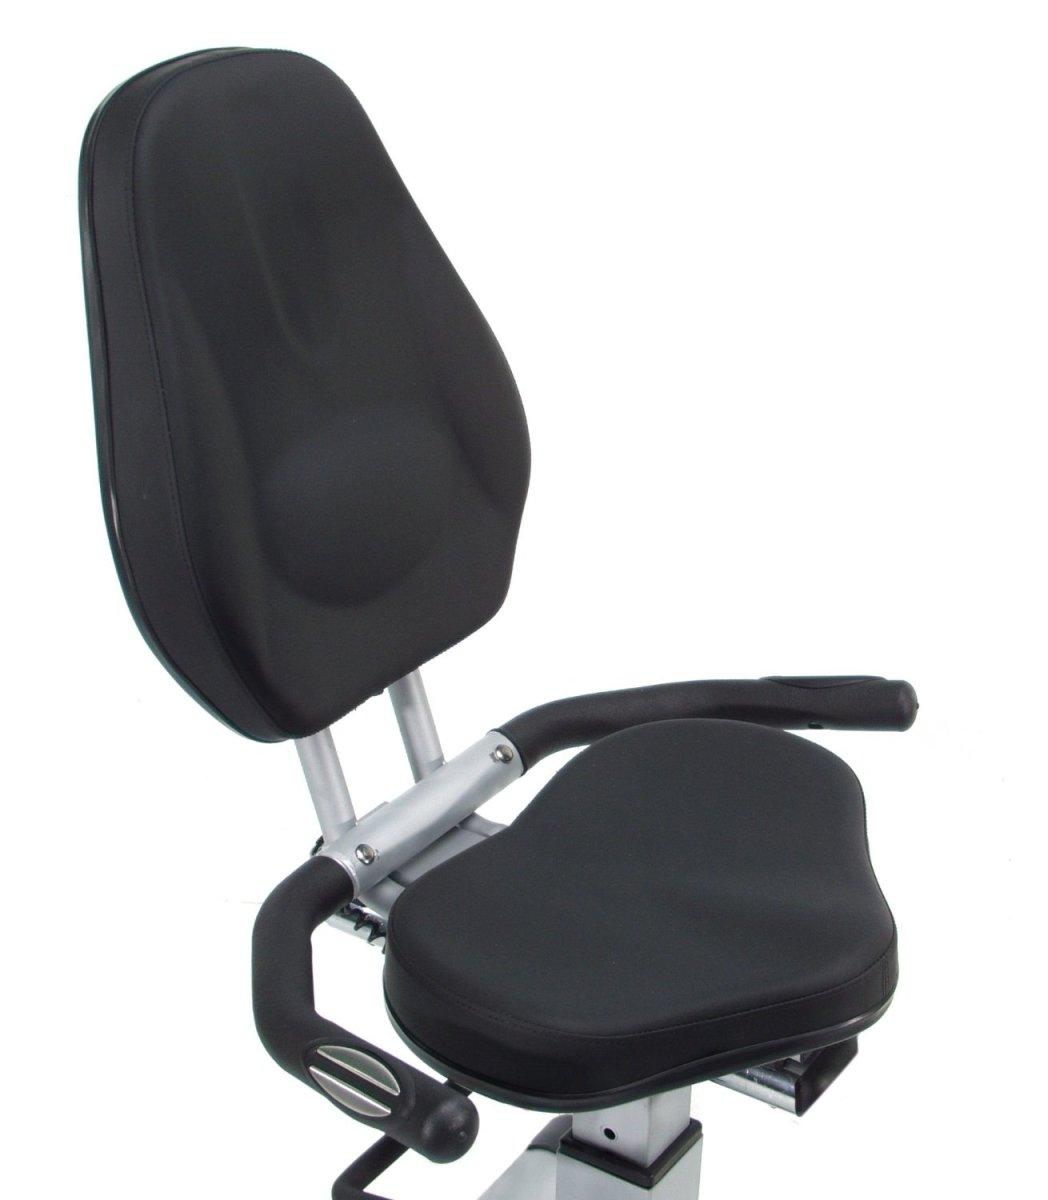 Stamina Elite Total Body Recumbent Exercise Bike seat